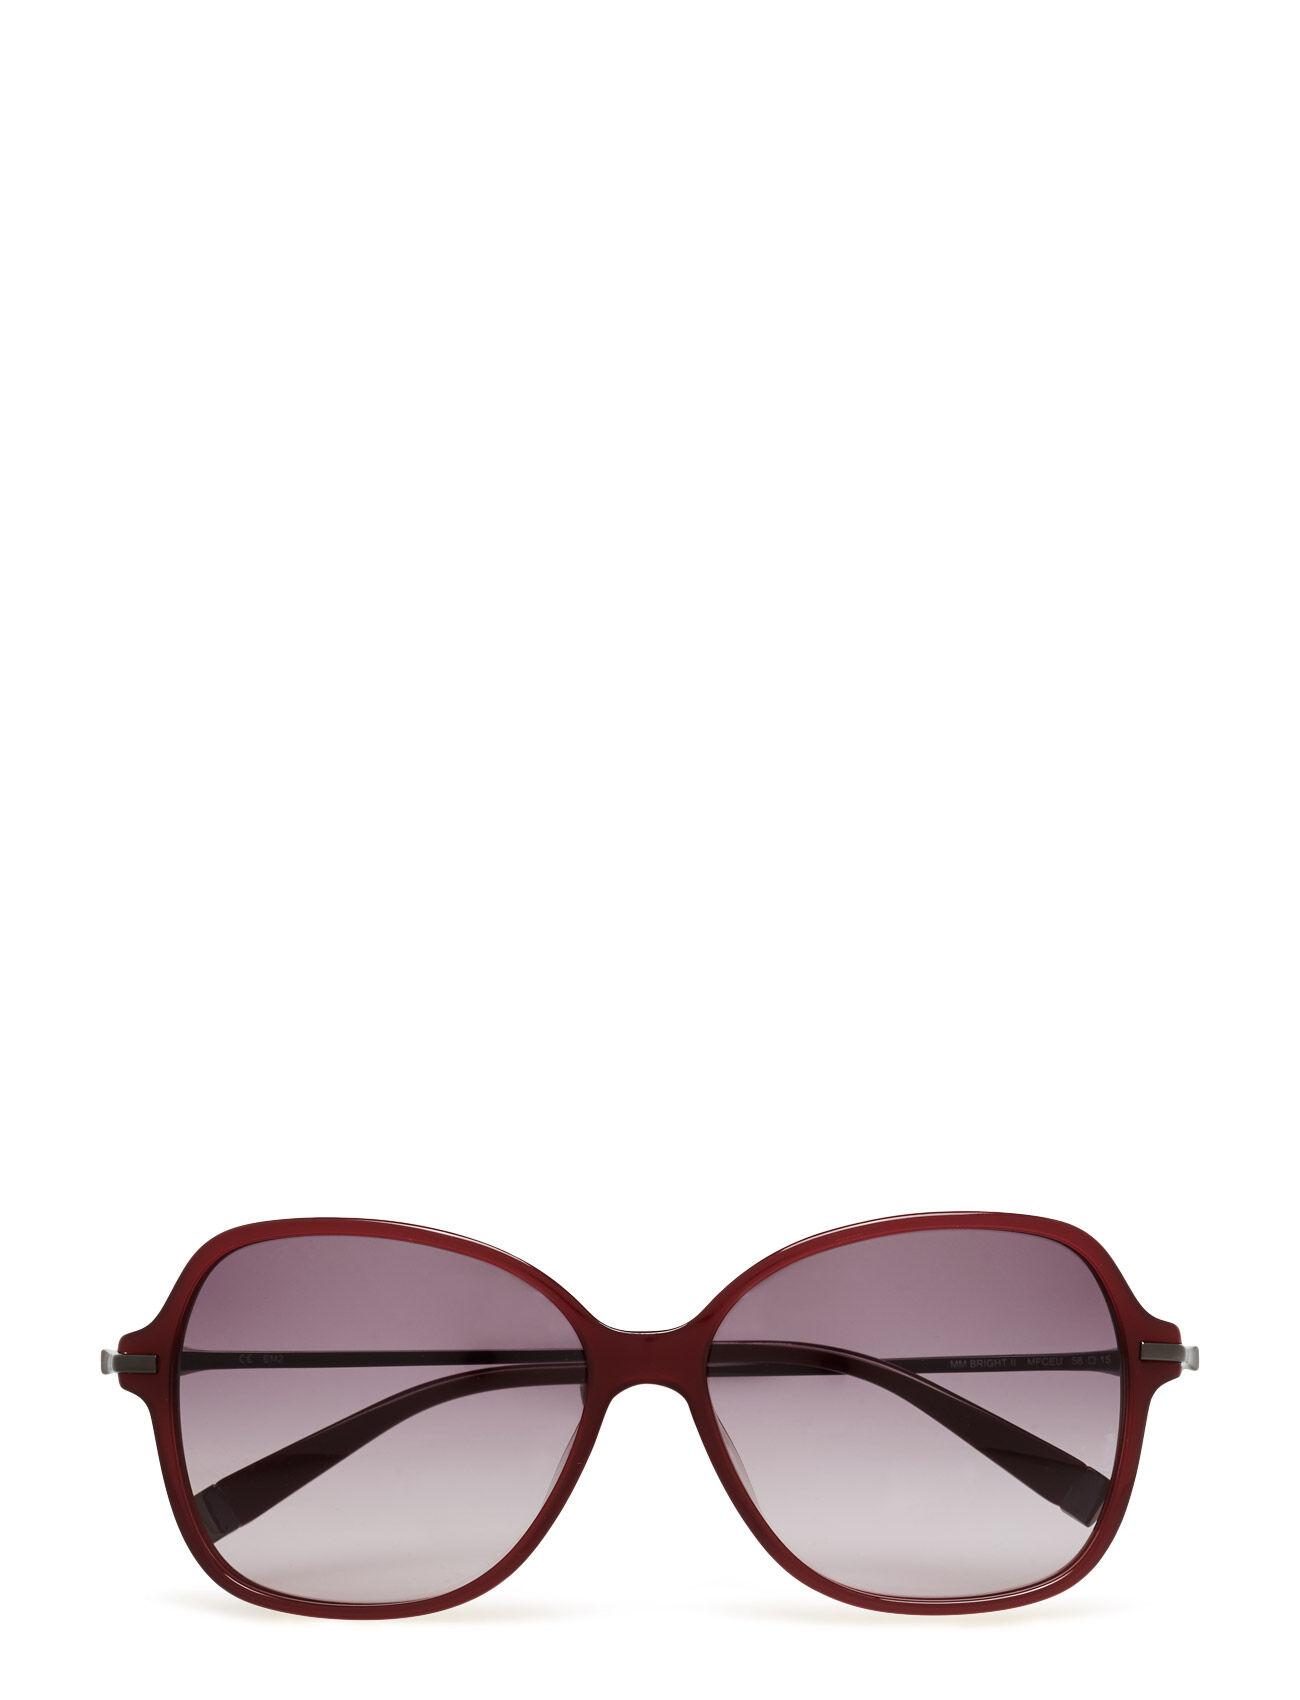 MAXMARA Sunglasses Mm Bright Ii